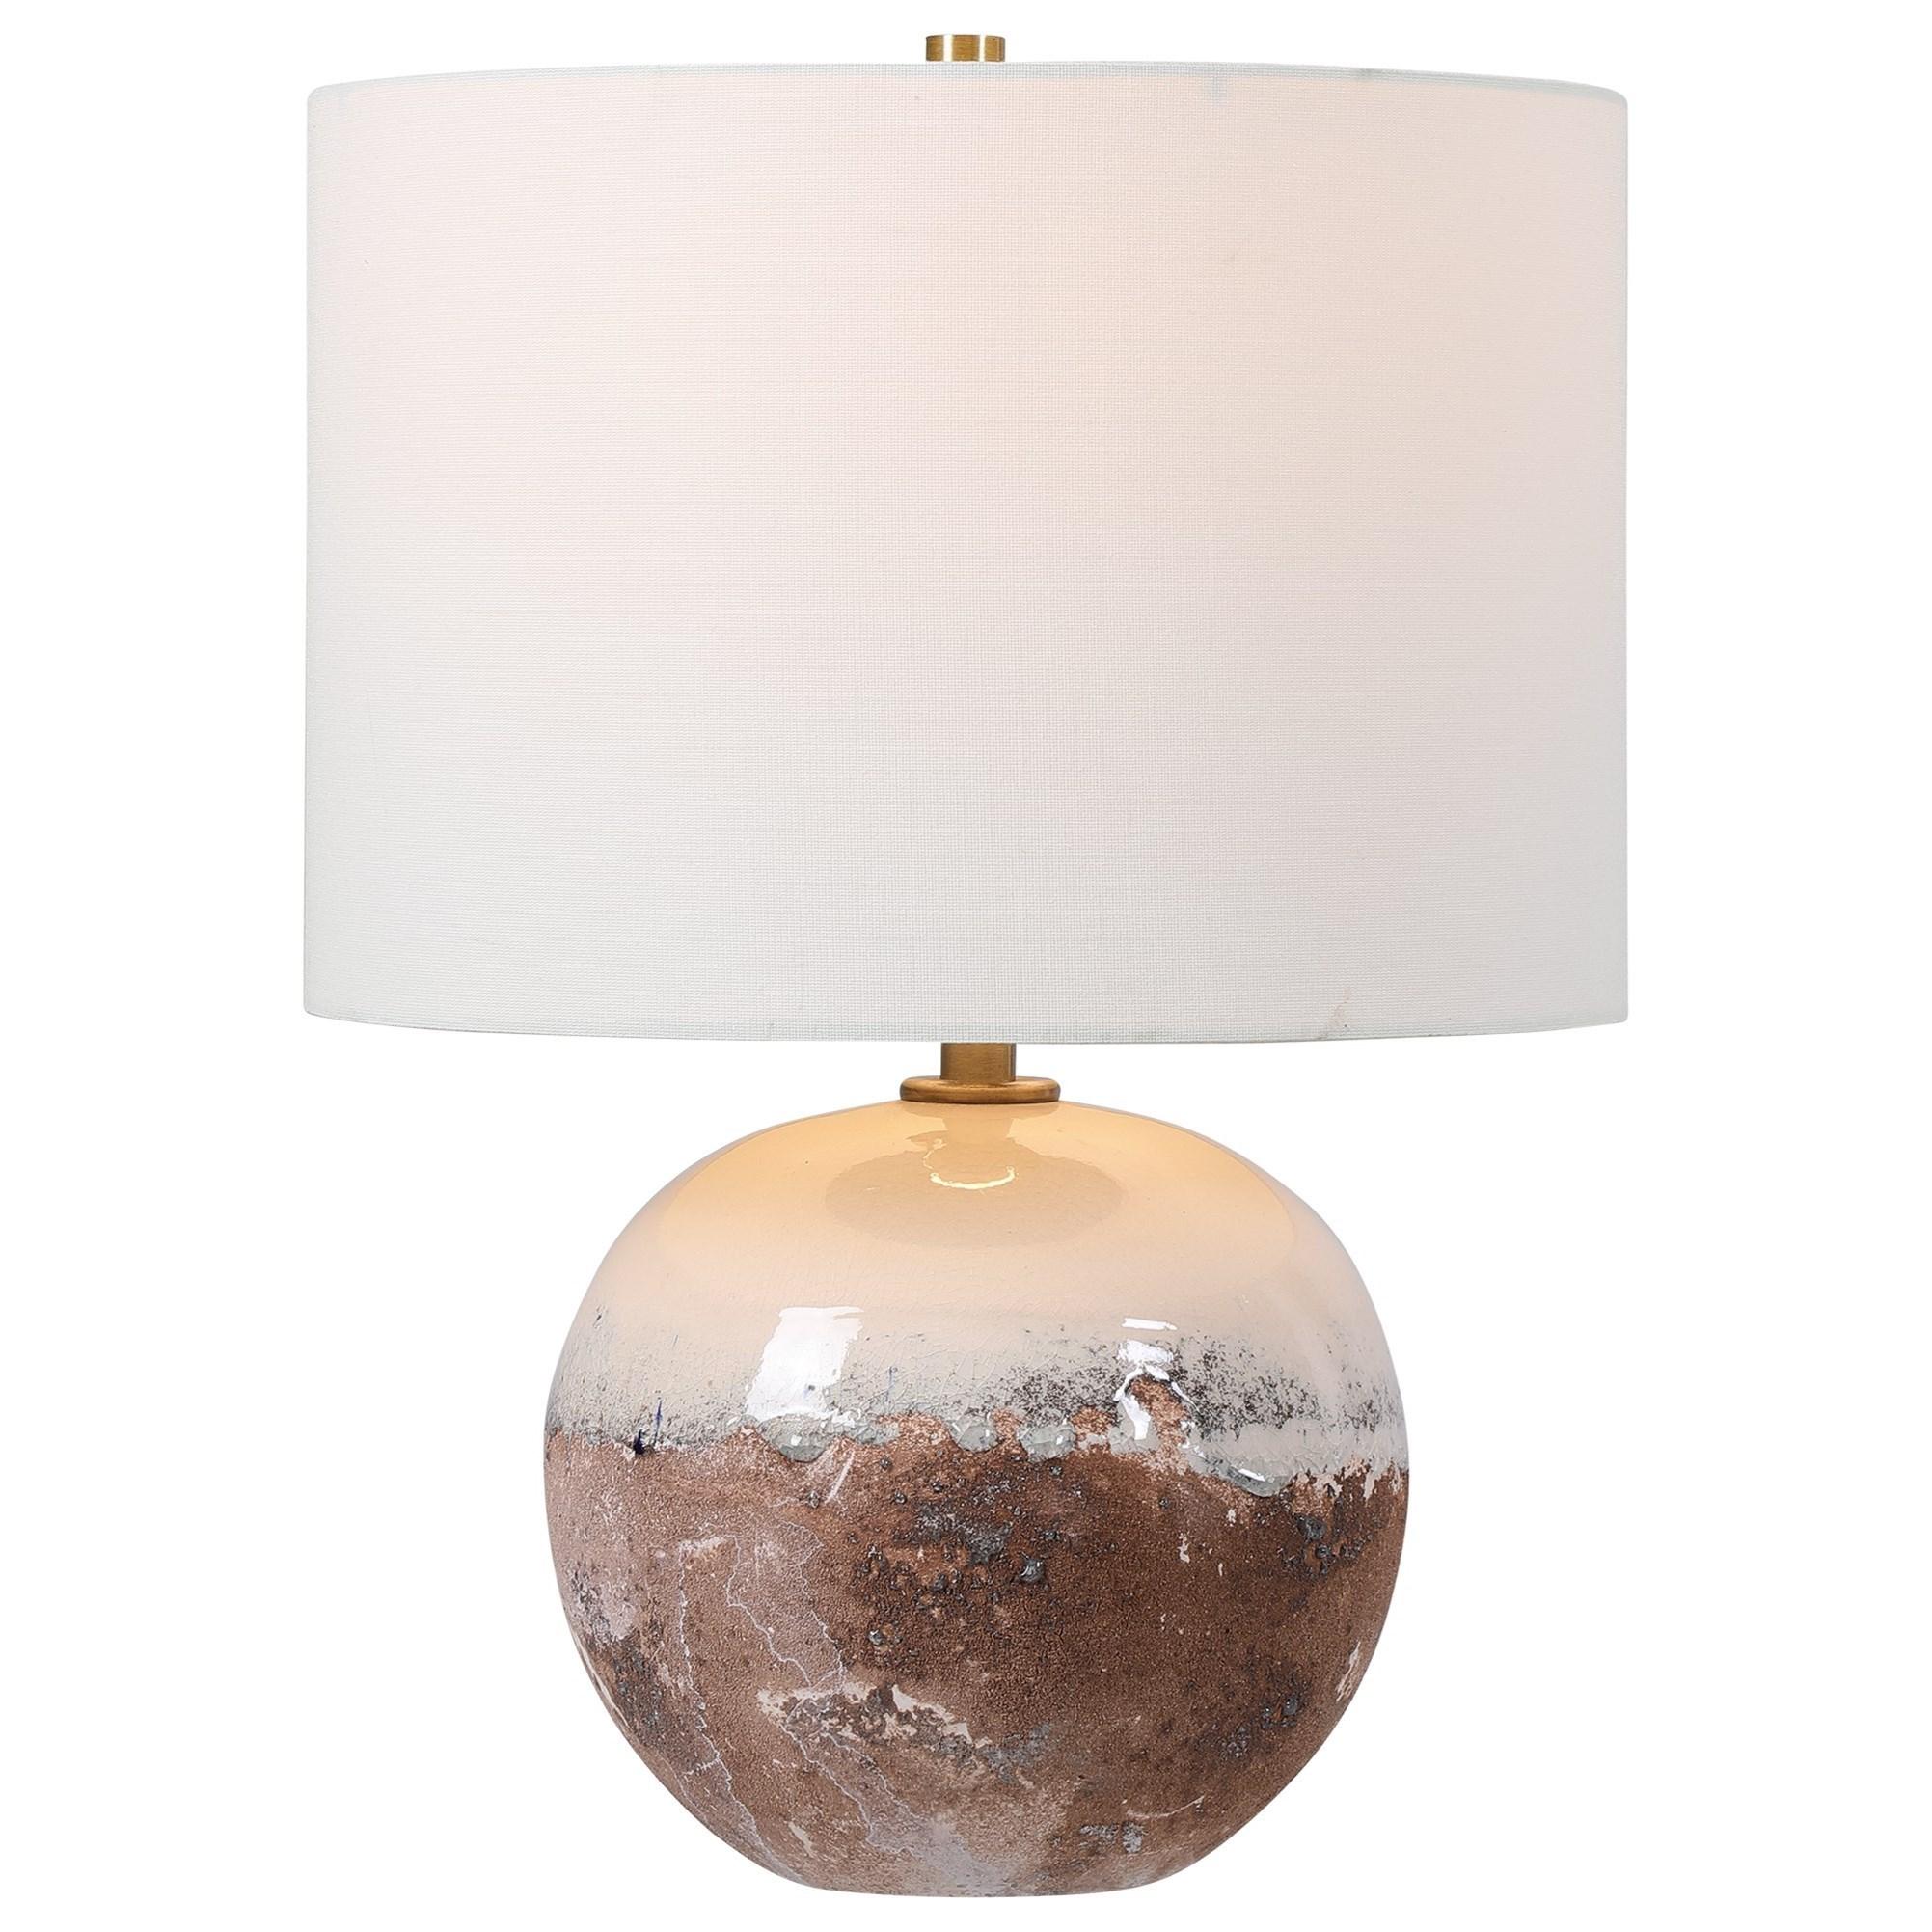 Durango Terracotta Accent Lamp